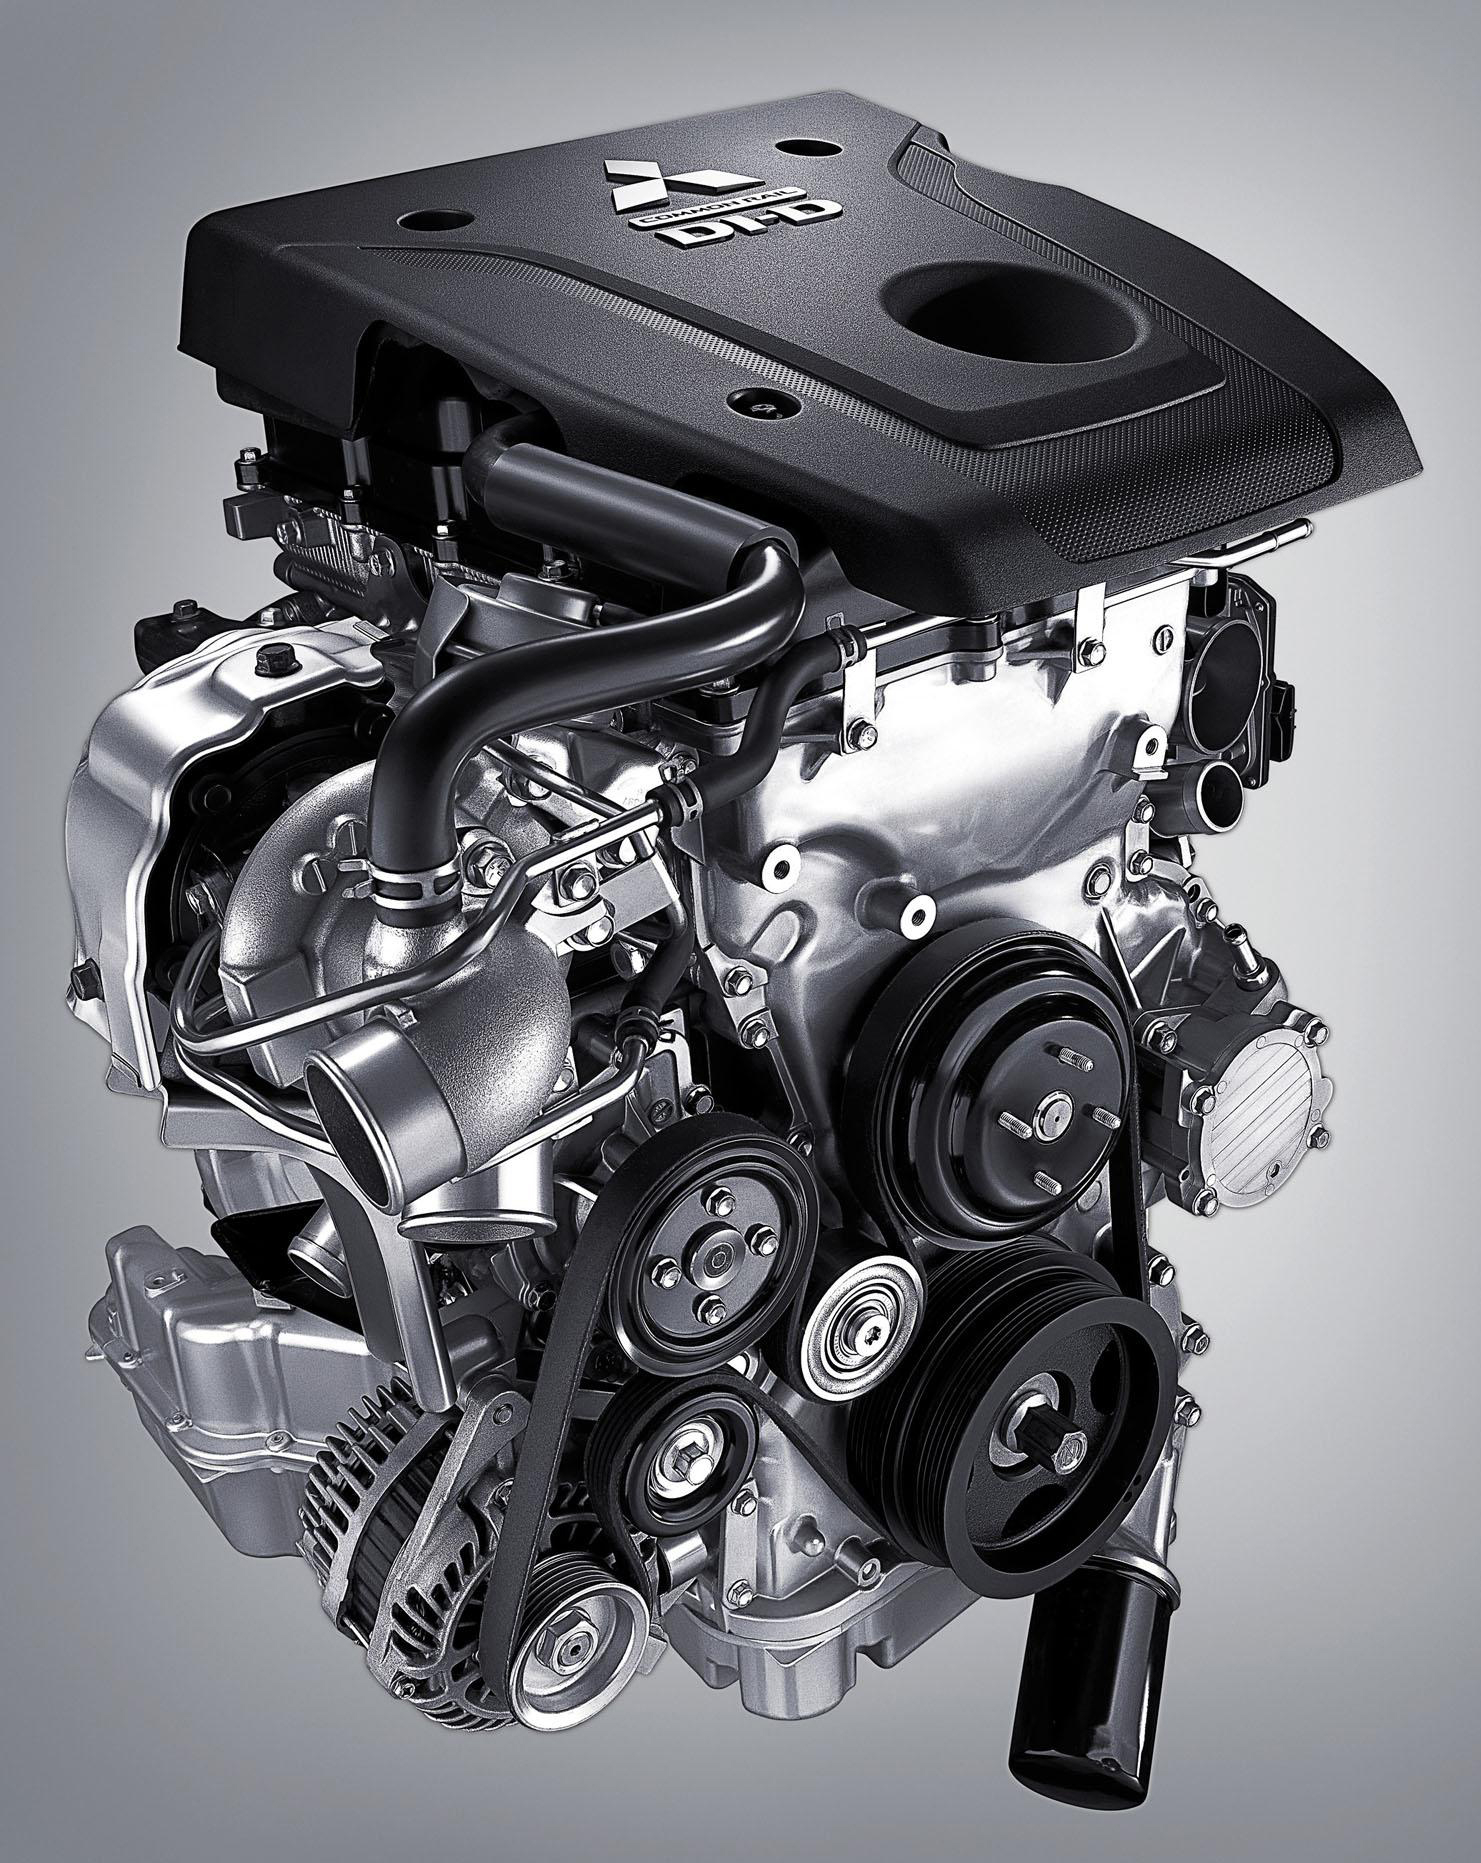 2015 Mitsubishi Triton Unveiled Gets New 2 4l Engine Paul